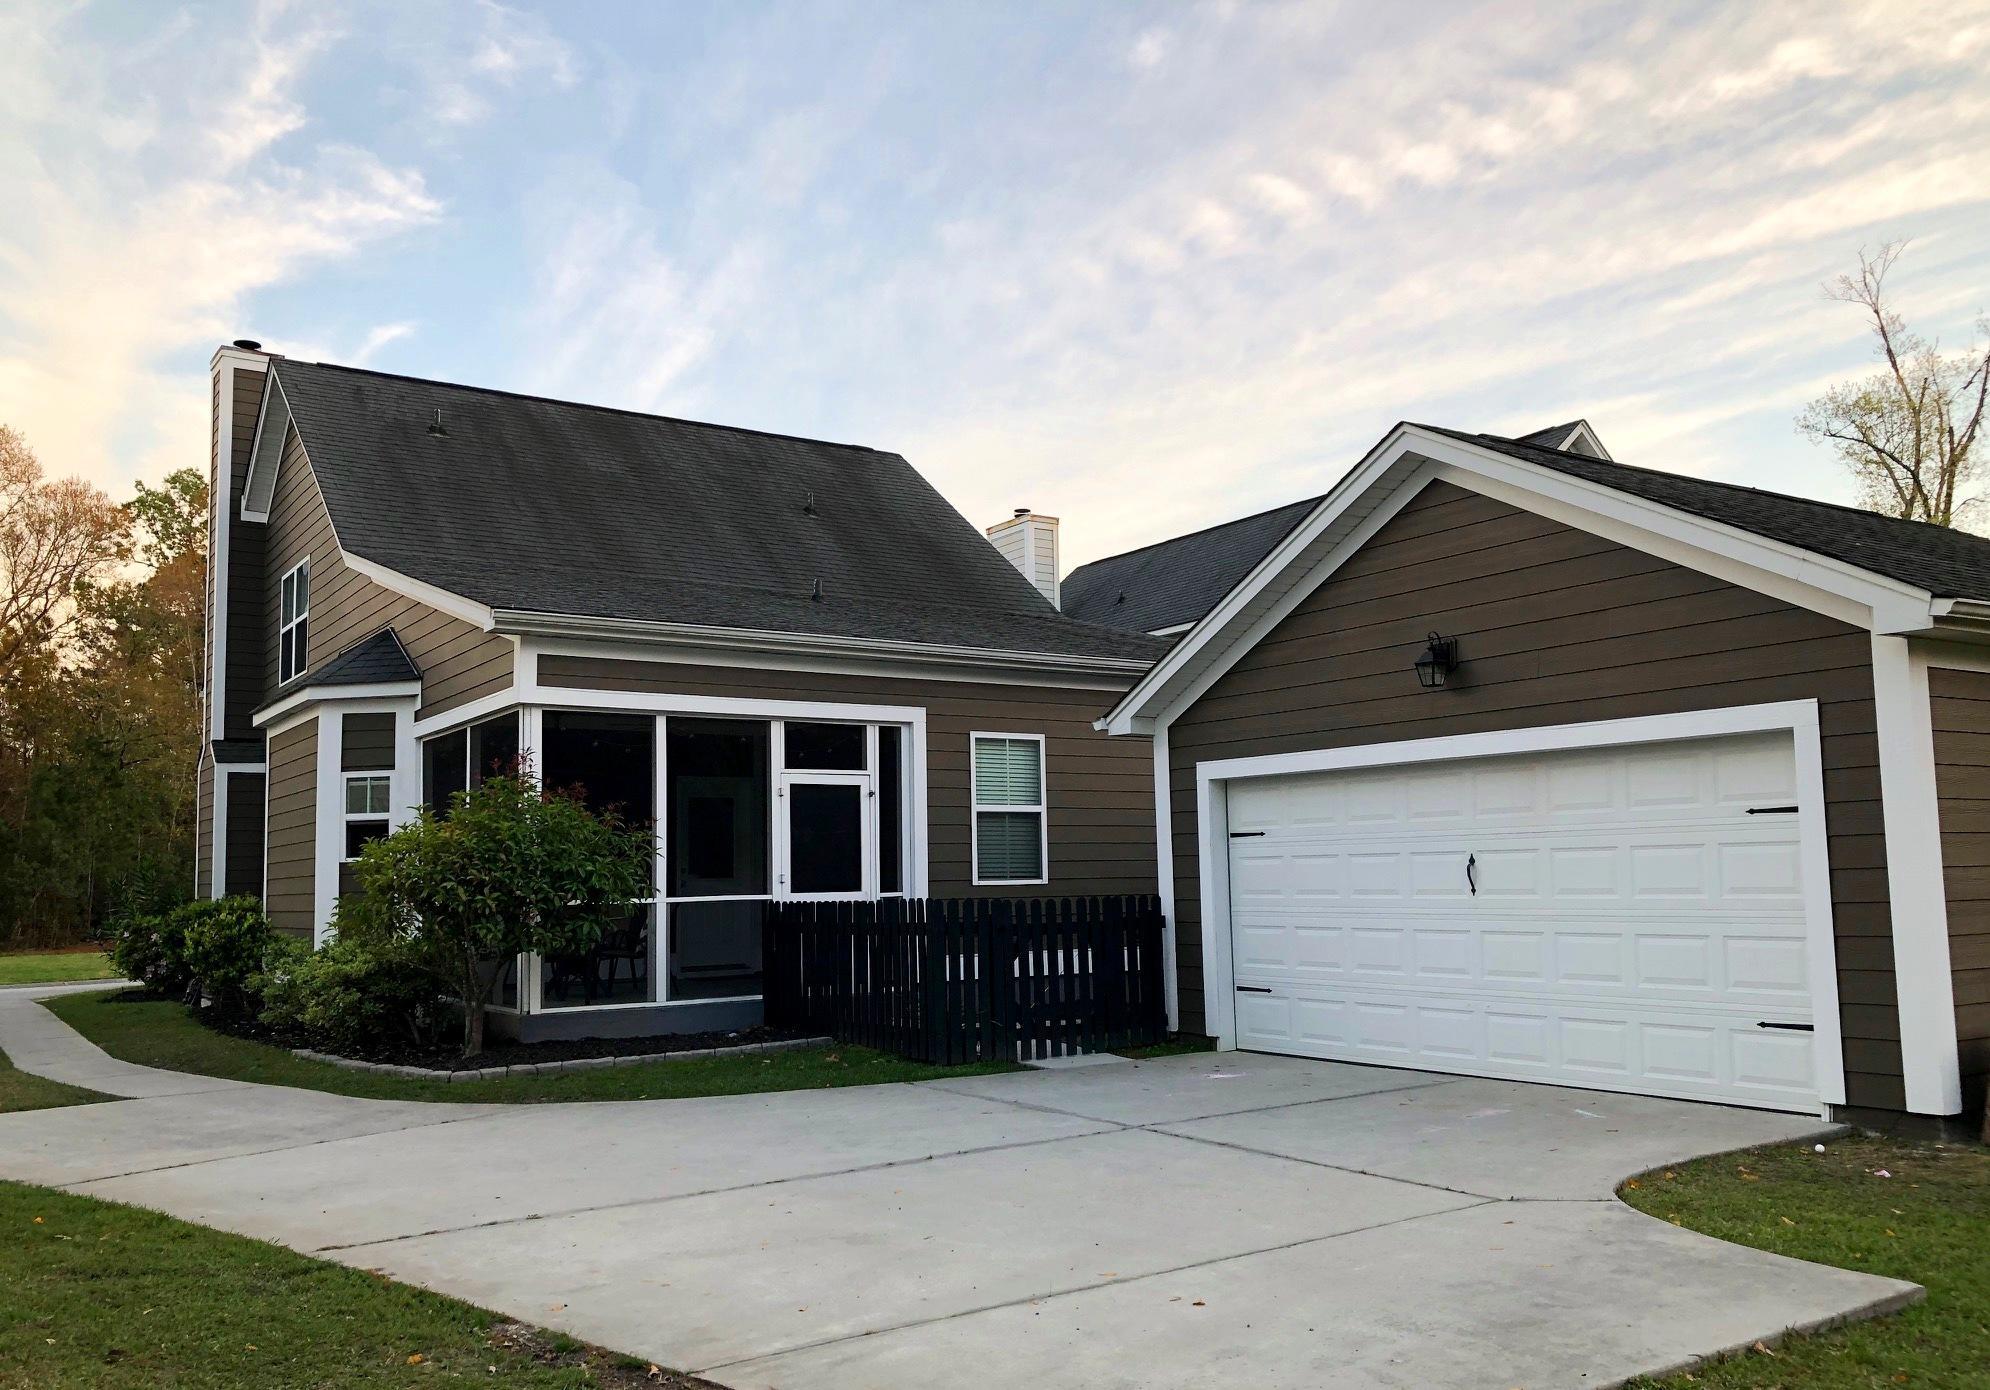 Carol Oaks Homes For Sale - 1316 Carol Oaks, Mount Pleasant, SC - 5